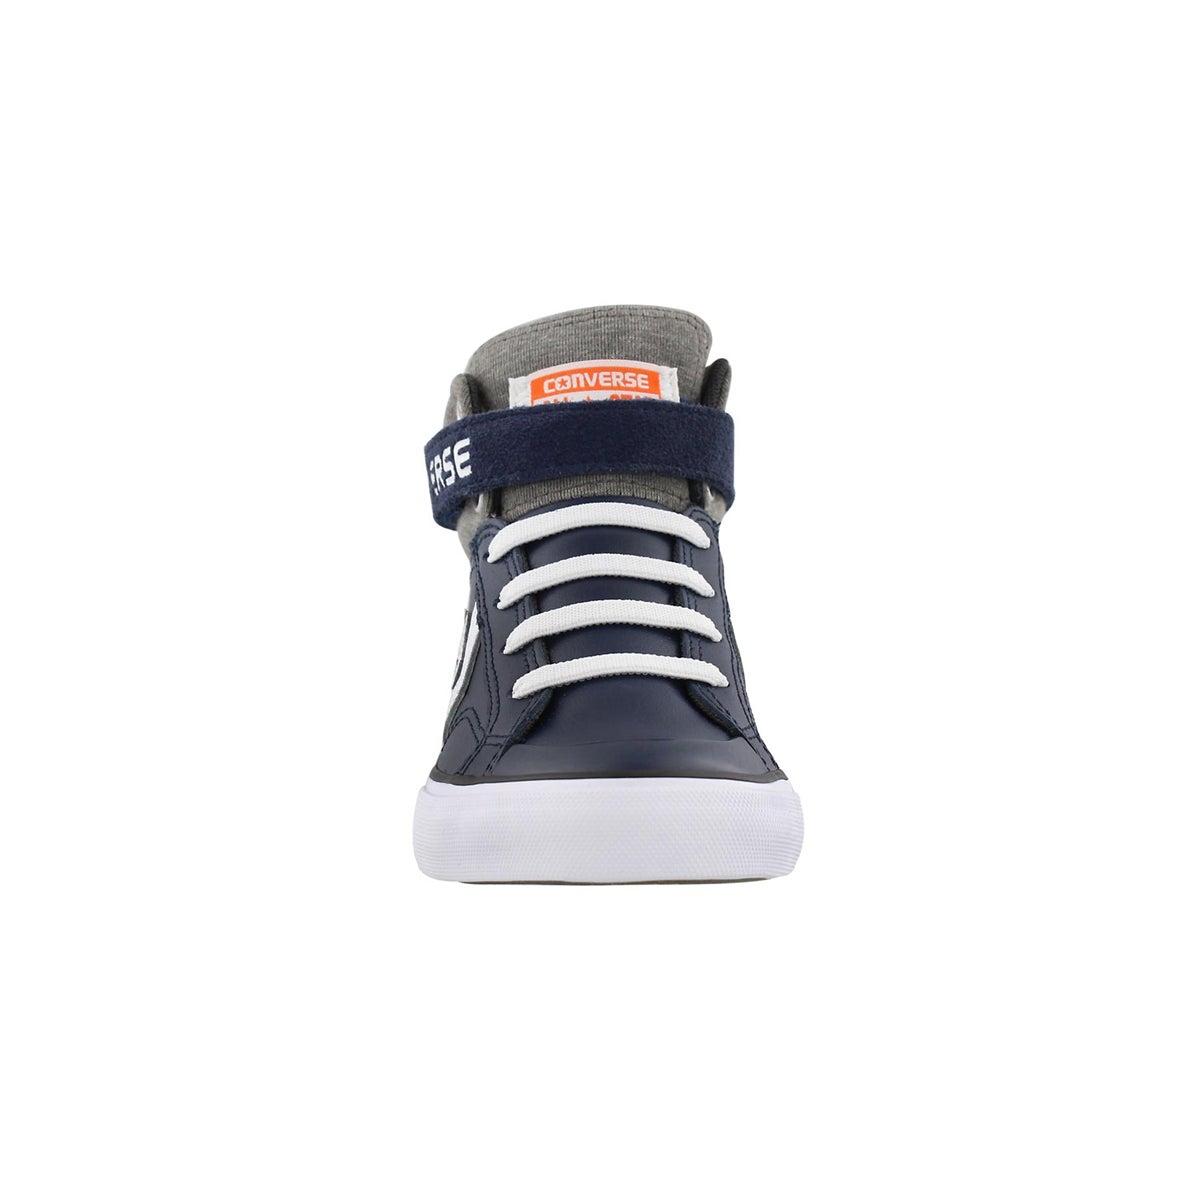 Bys Pro Blaze Hi navy/storm sneaker